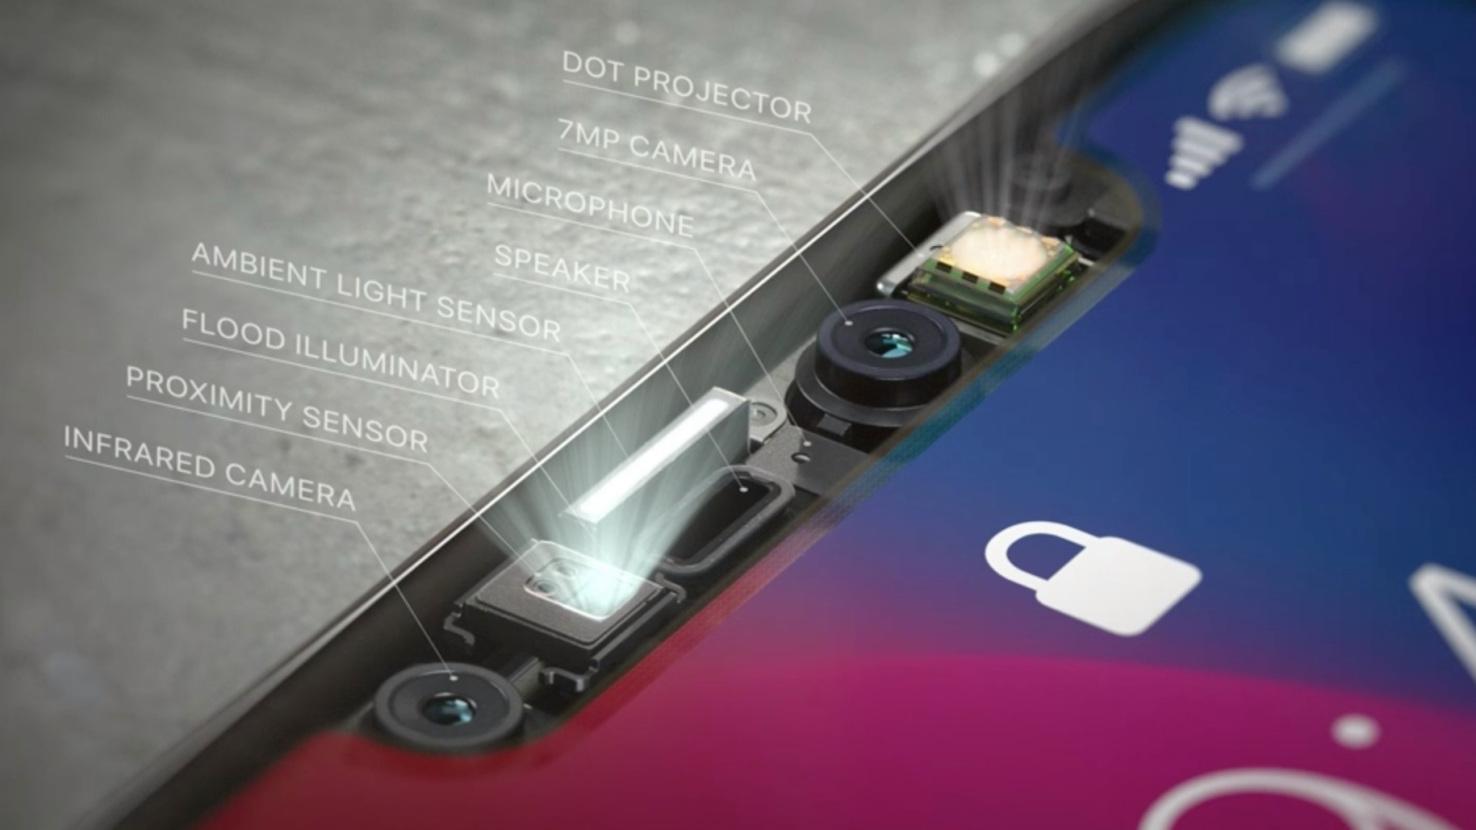 frontcam_depth_iphone-x.jpg-188kB